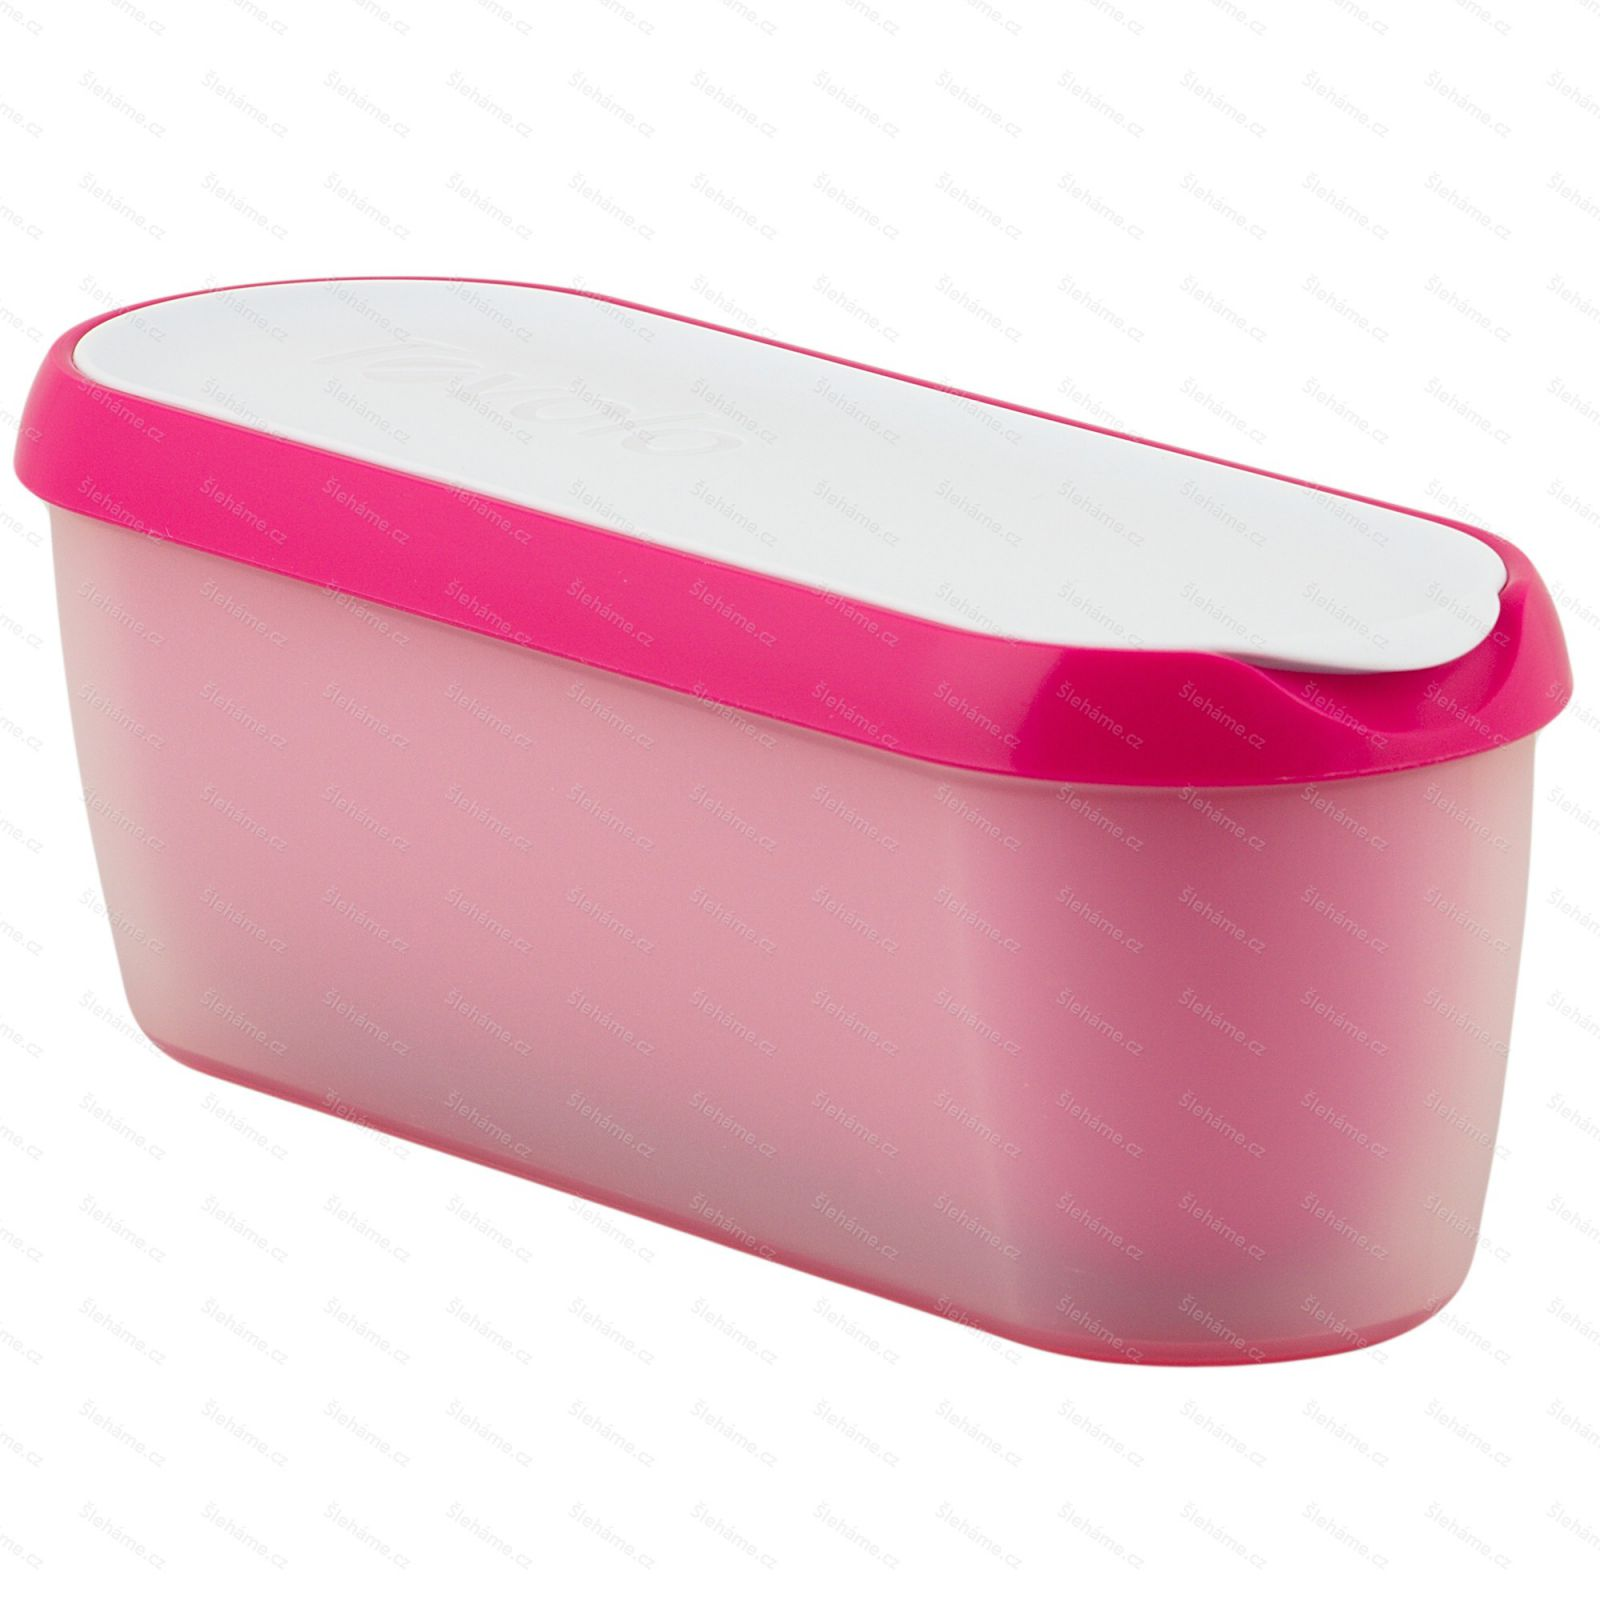 Ice cream tub Tovolo GLIDE-A-SCOOP 1.4 l, raspberry tart